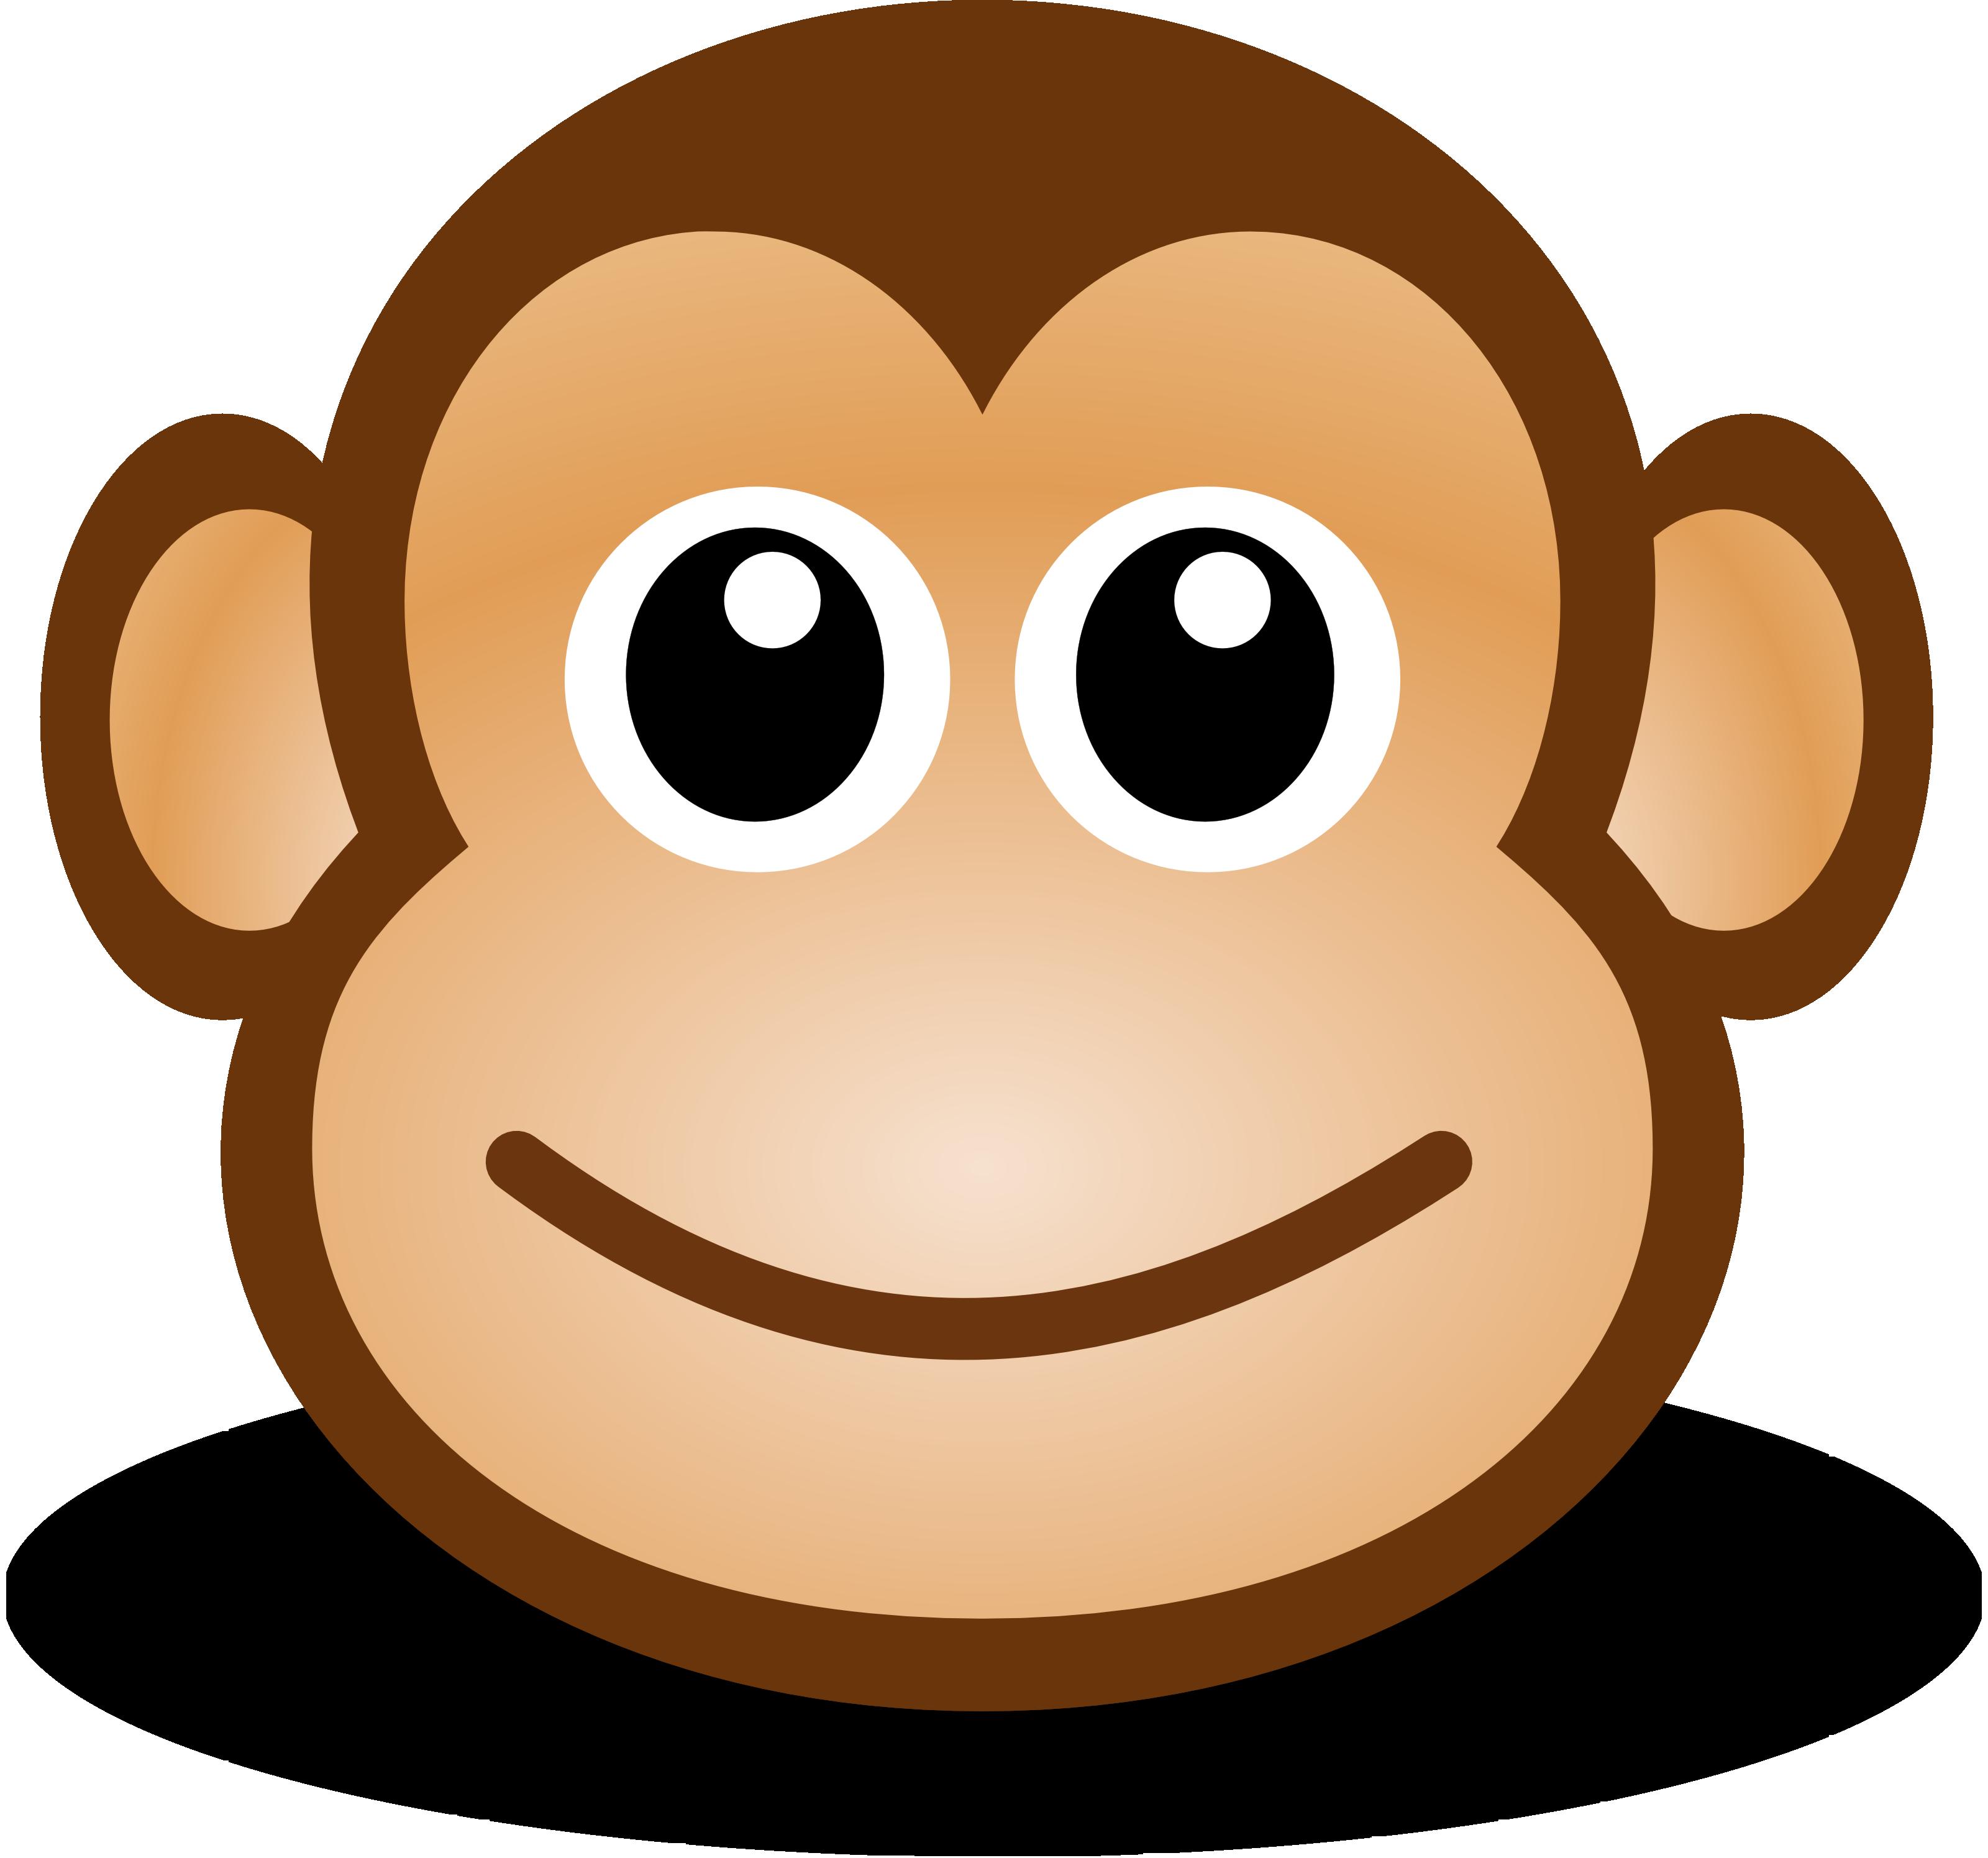 .jpg, .png, .svg,. Free Cute Cartoon Monkey Clipart Illustration